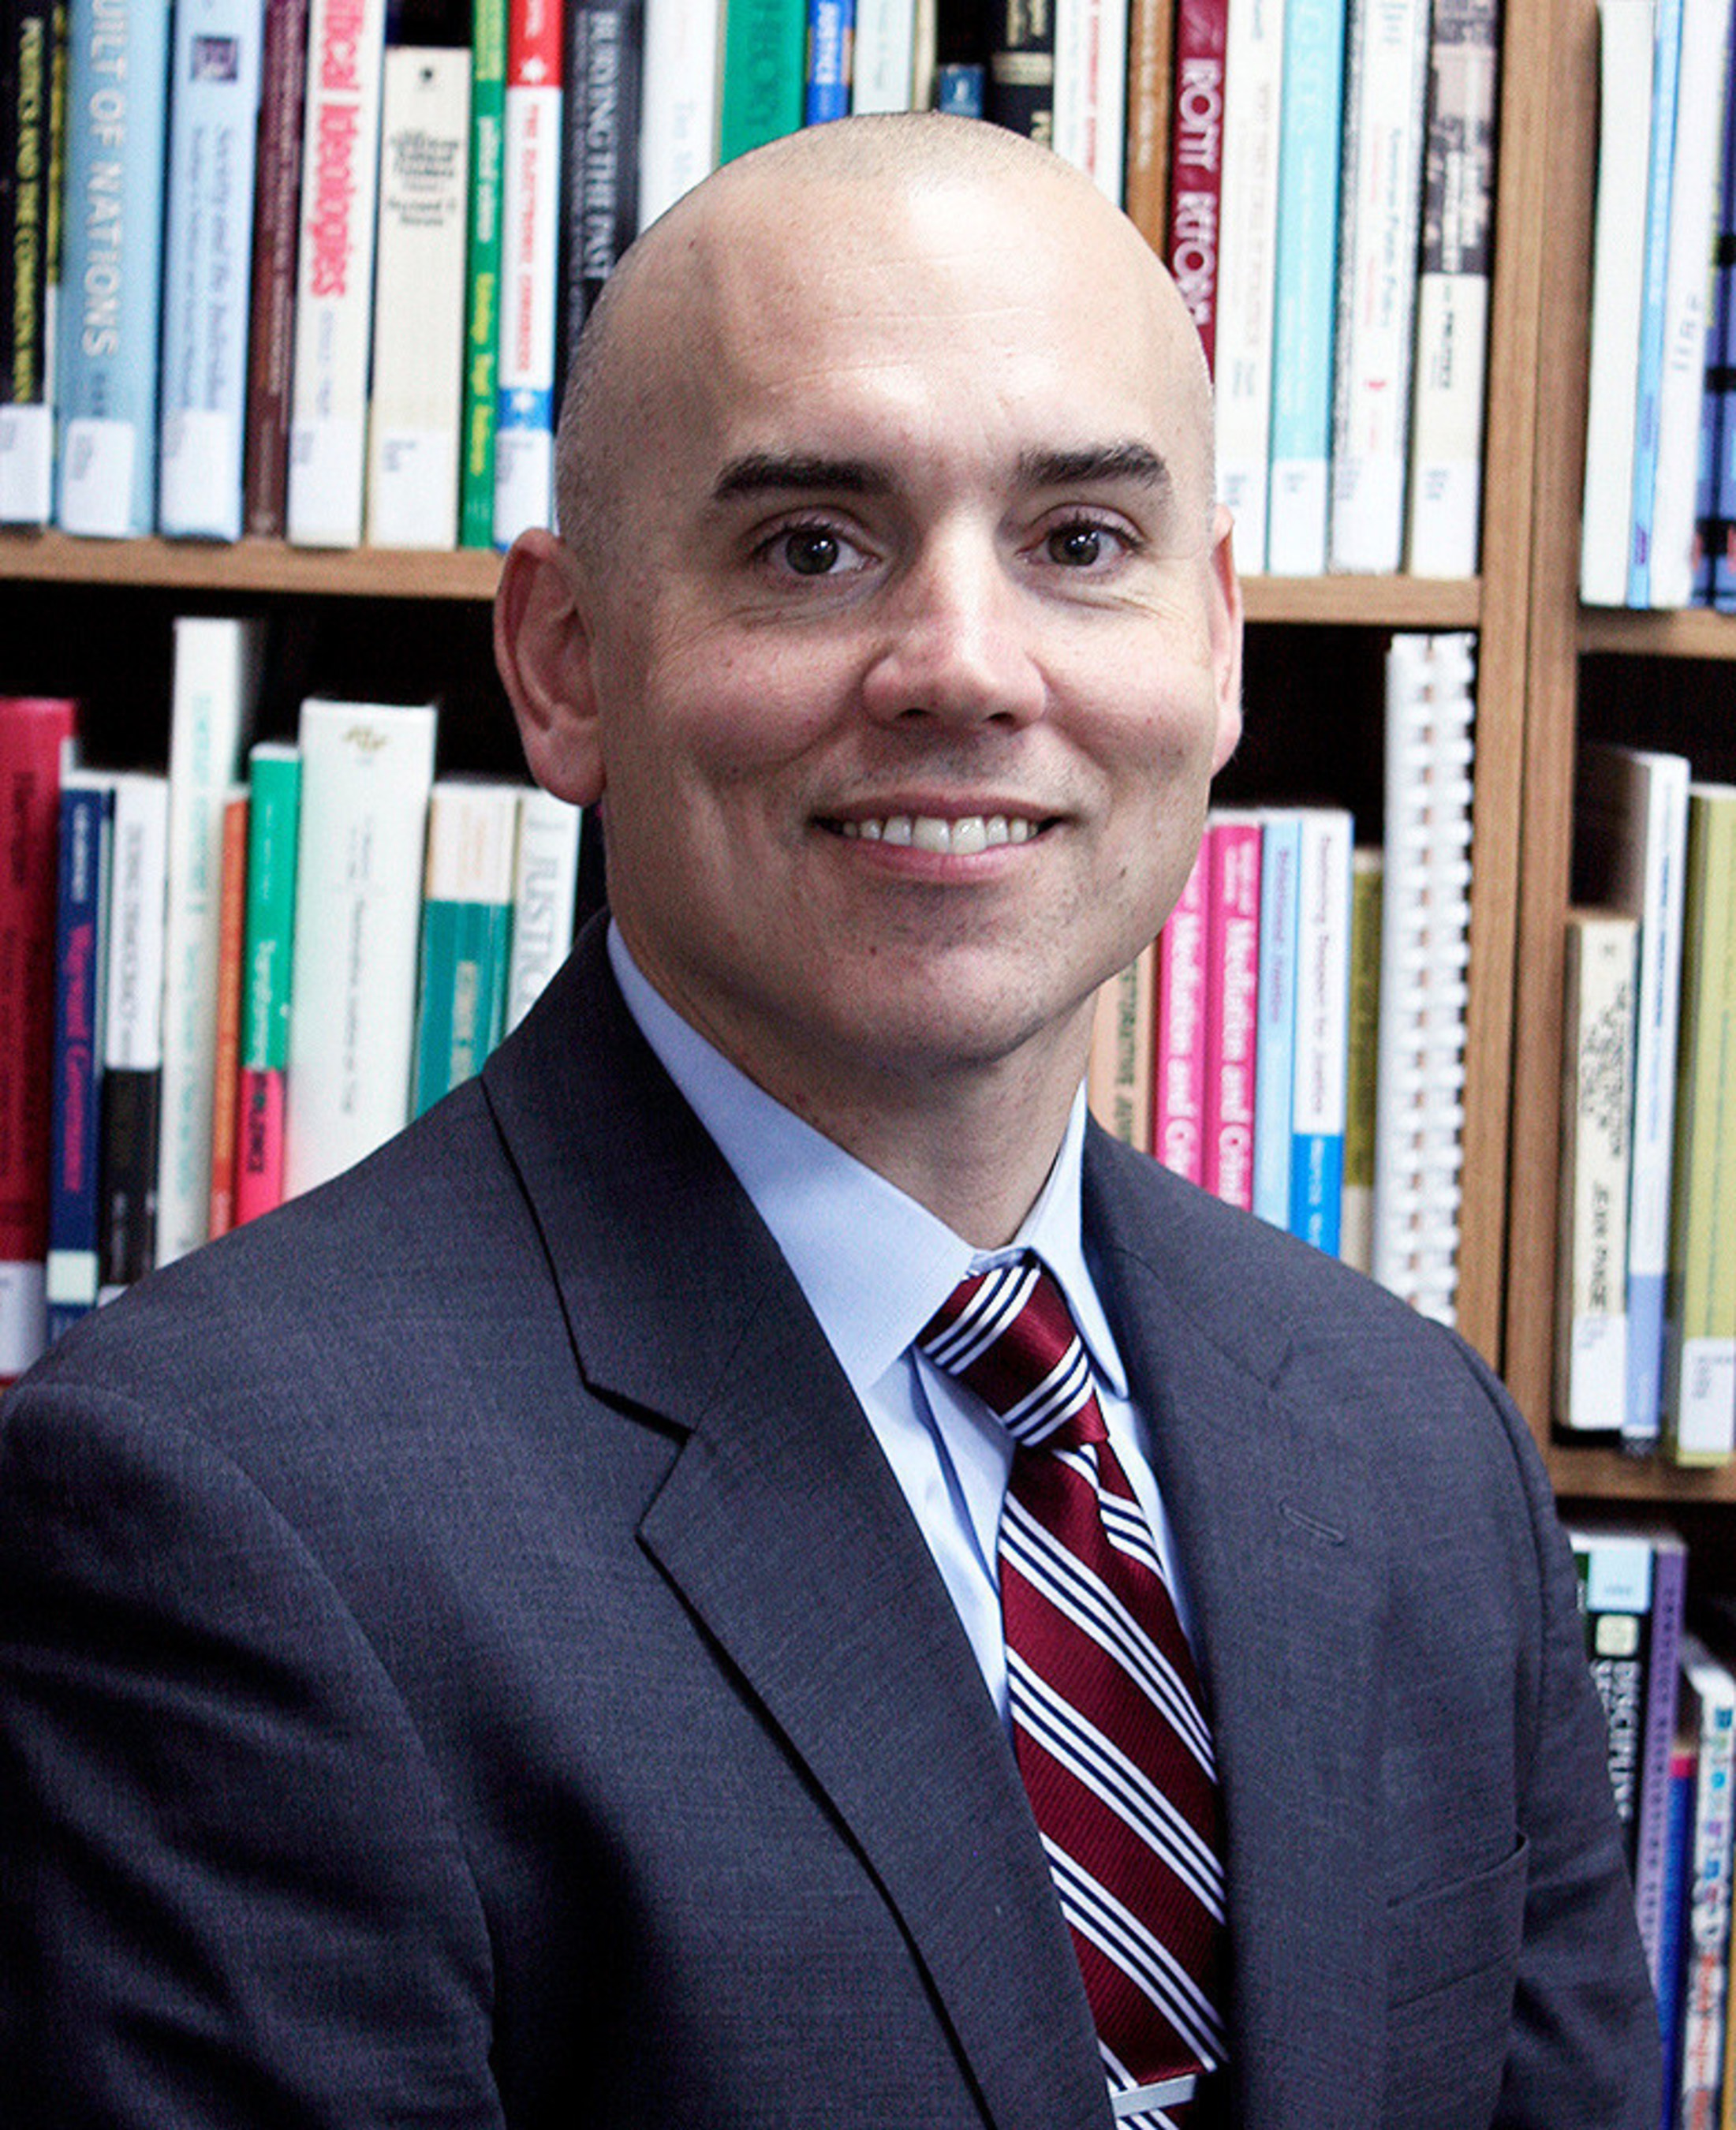 John Bailie, president of the International Institute for Restorative Practices Graduate School